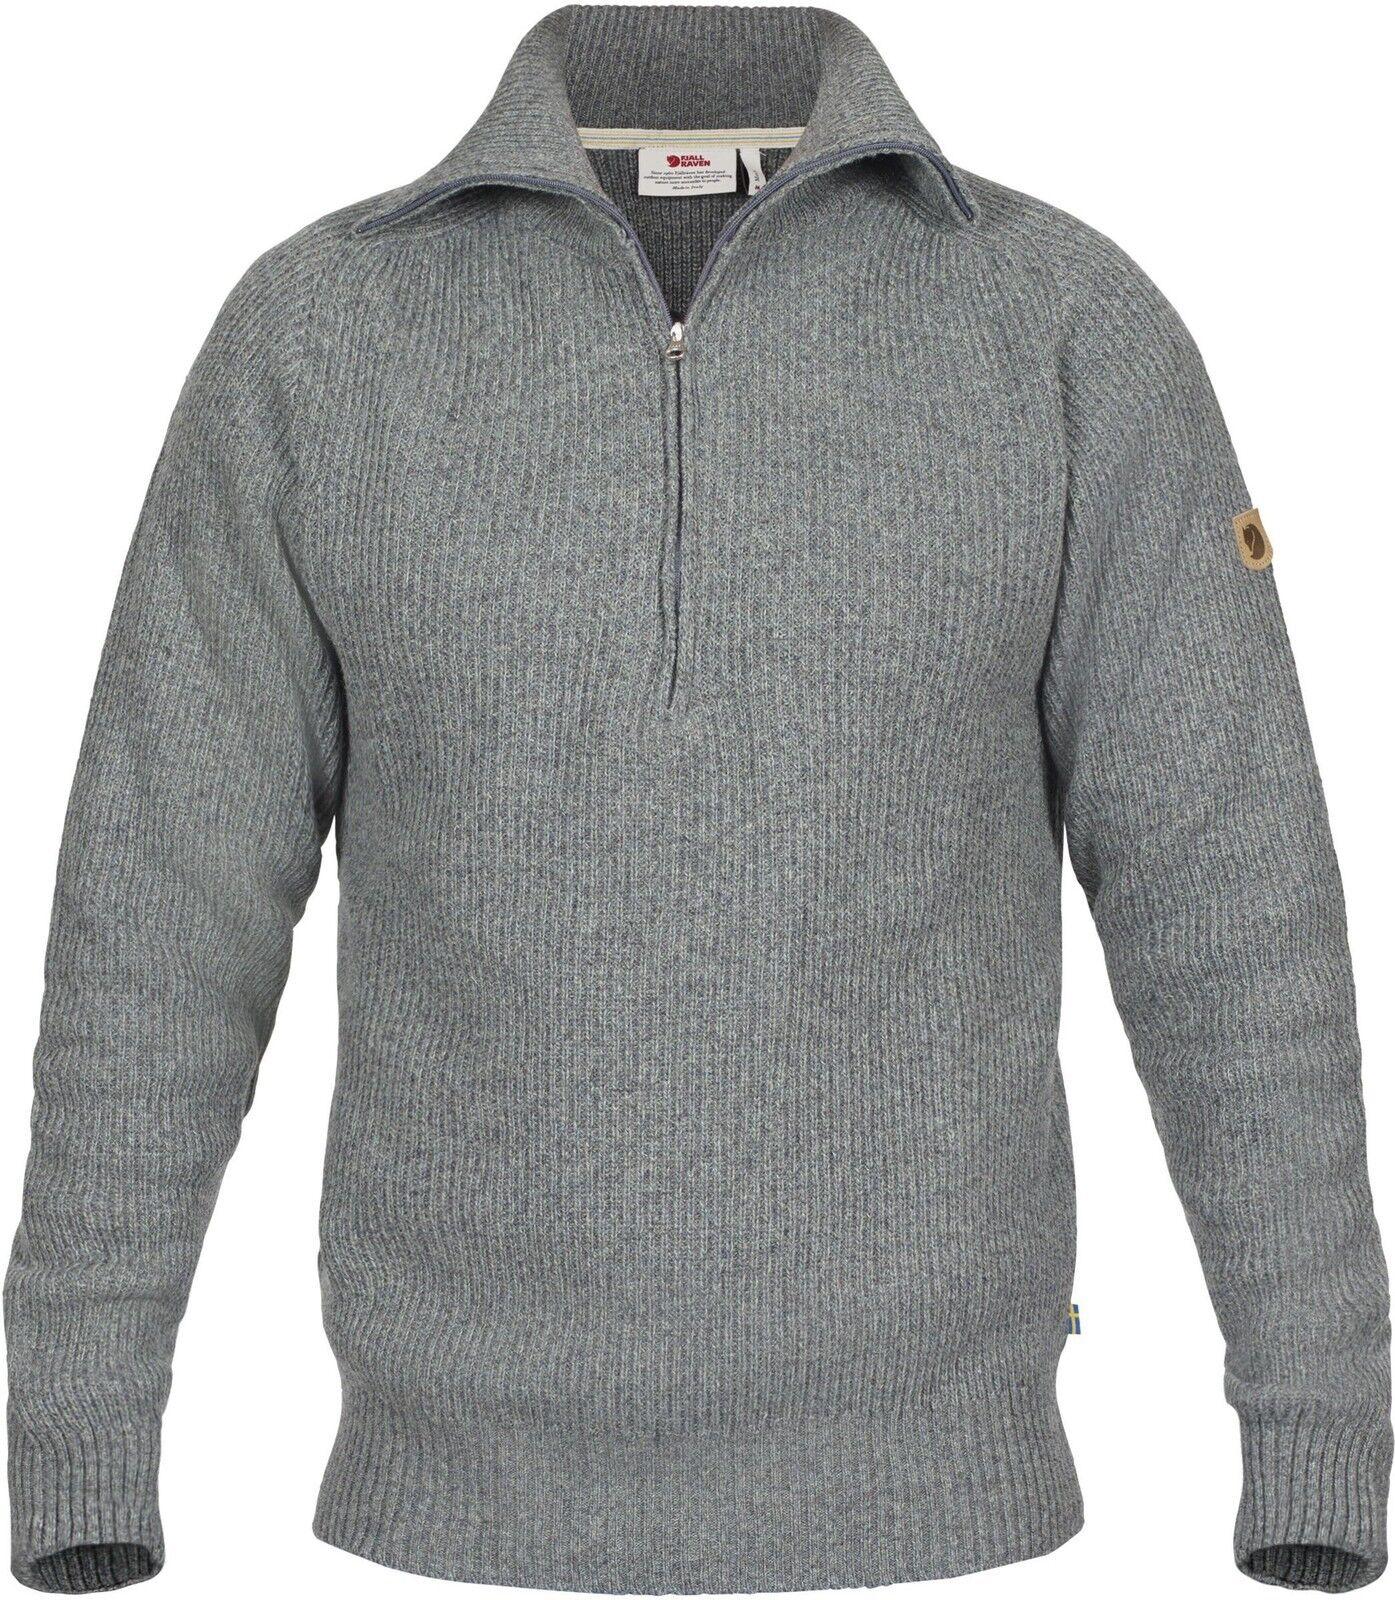 Fjäll Räven Grünland Re-Wool Sweater M 81863 Gr. M M M Thunder Grau 6d57c1